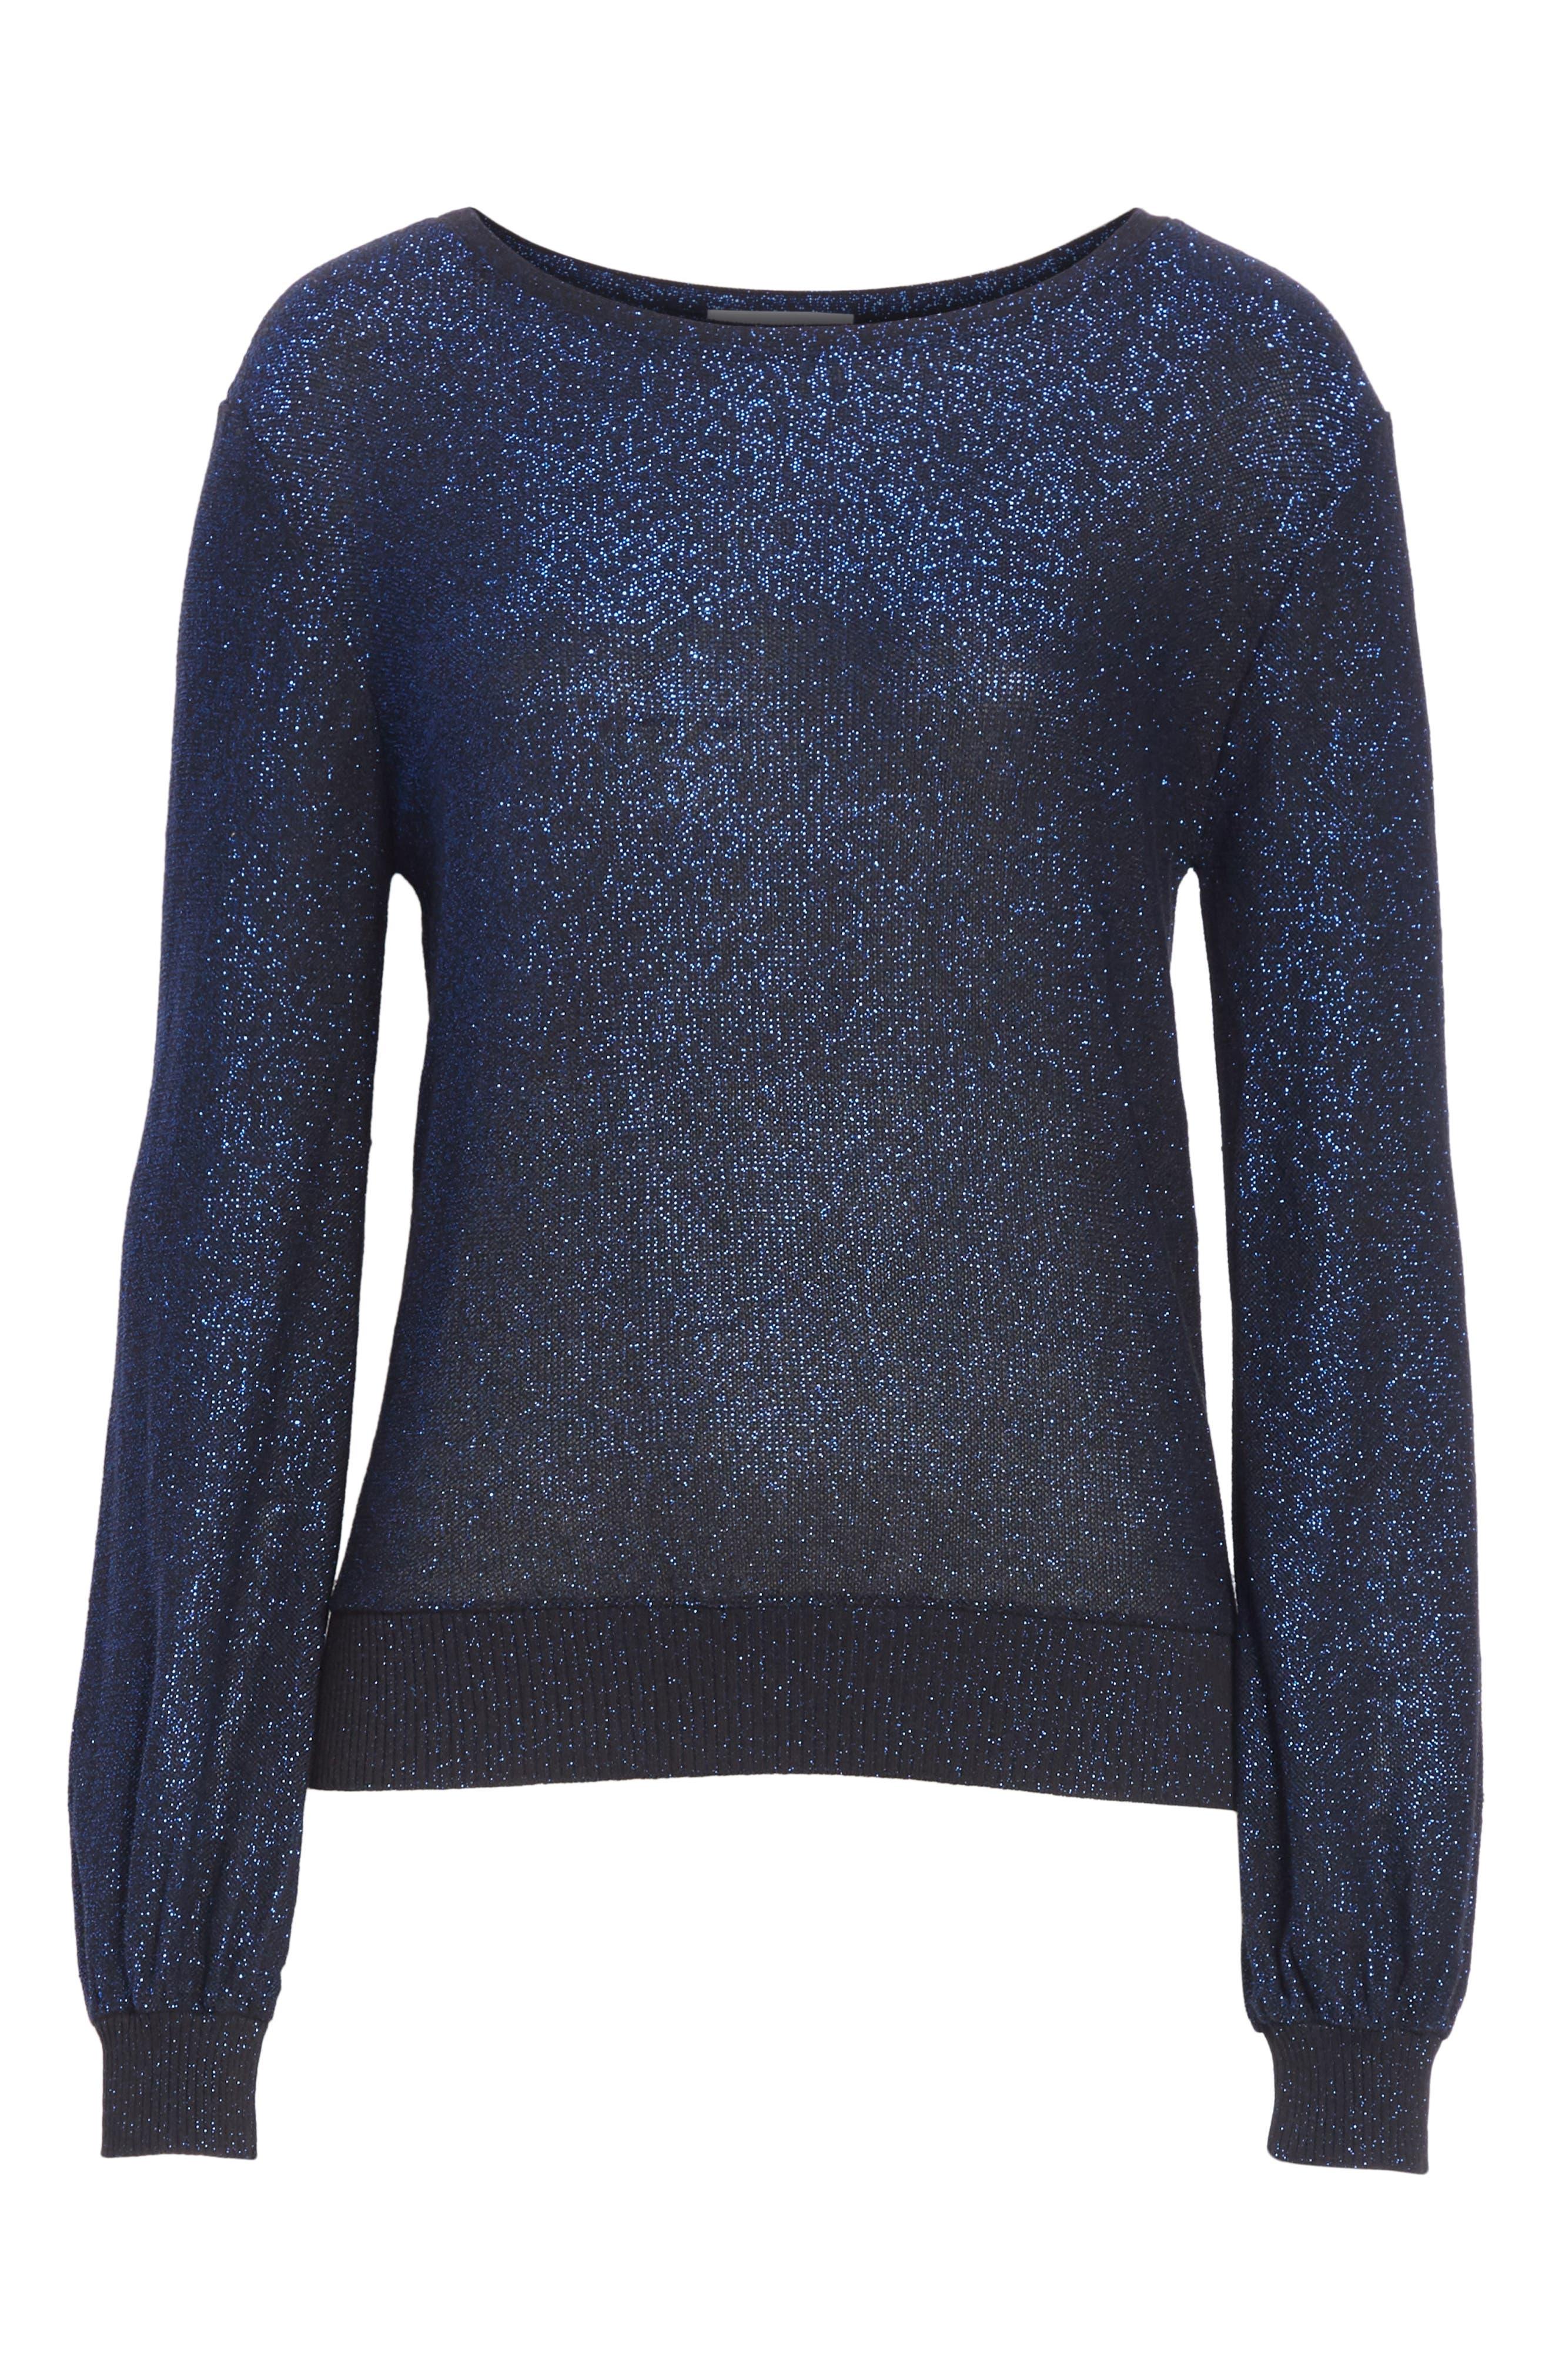 Metallic Shimmer Cotton Blend Sweater,                             Alternate thumbnail 6, color,                             430